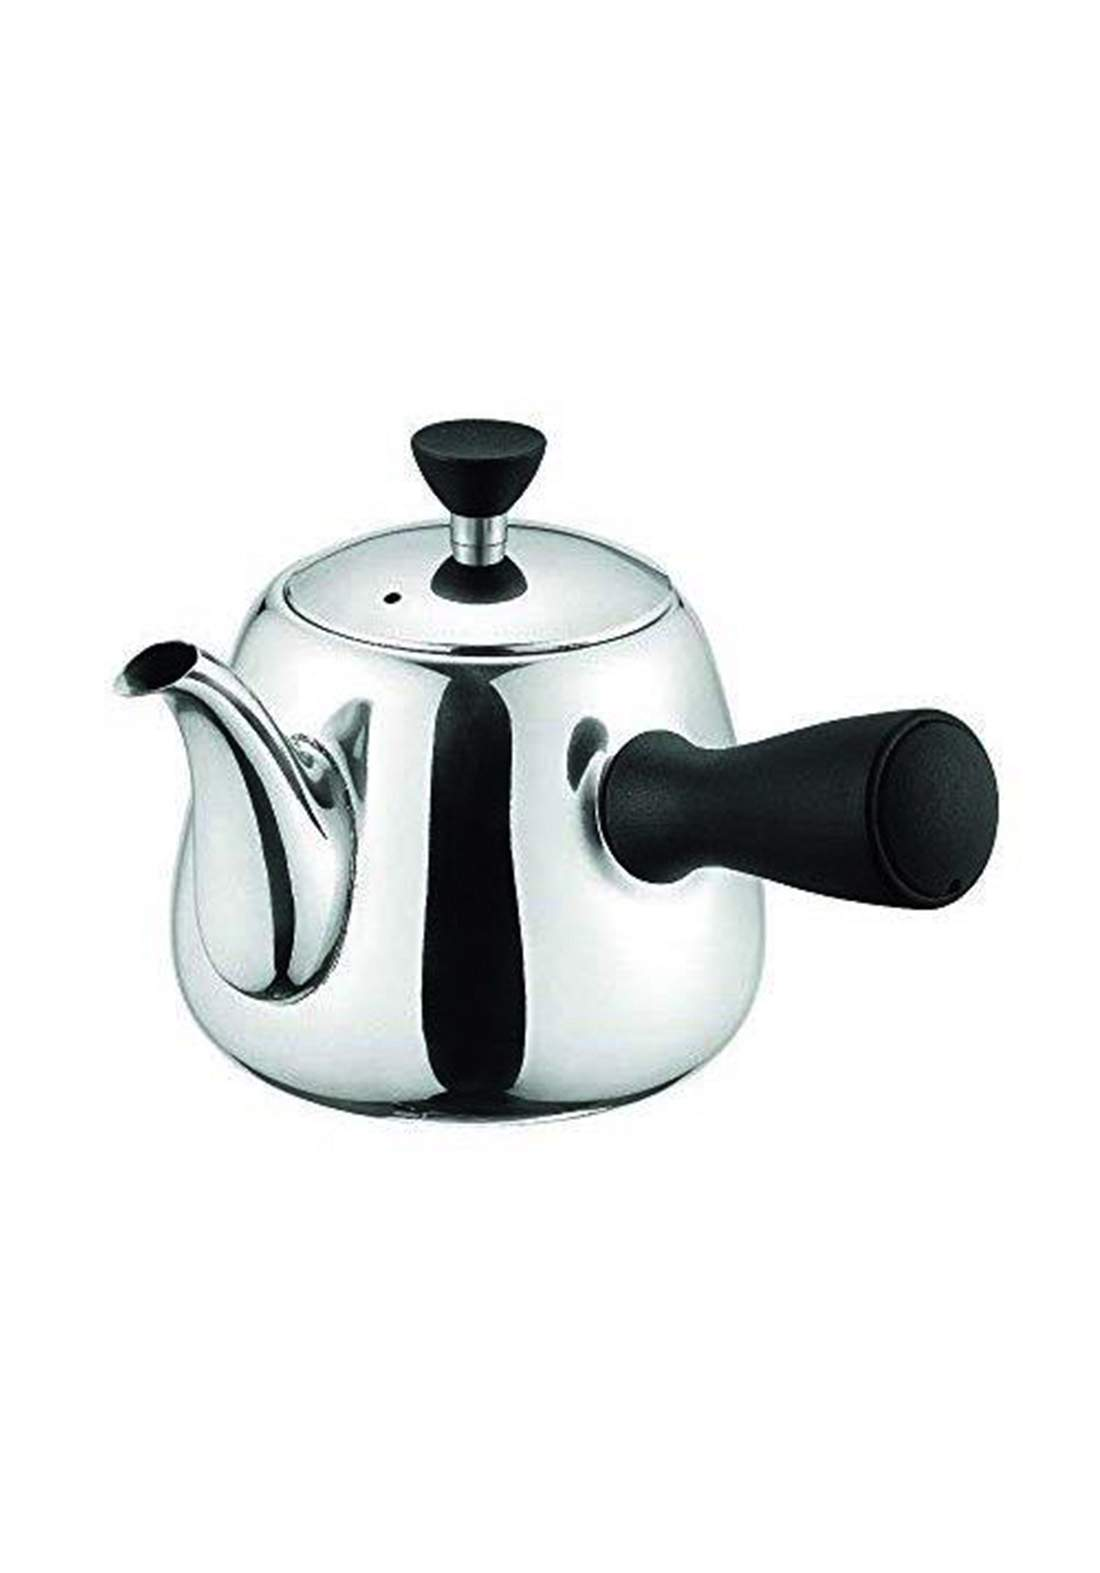 Pearl Metal HB-4421 Just Size Stainless Steel Teapot Sideways 600mL  Coffee Tea Supplies أبريق شاي